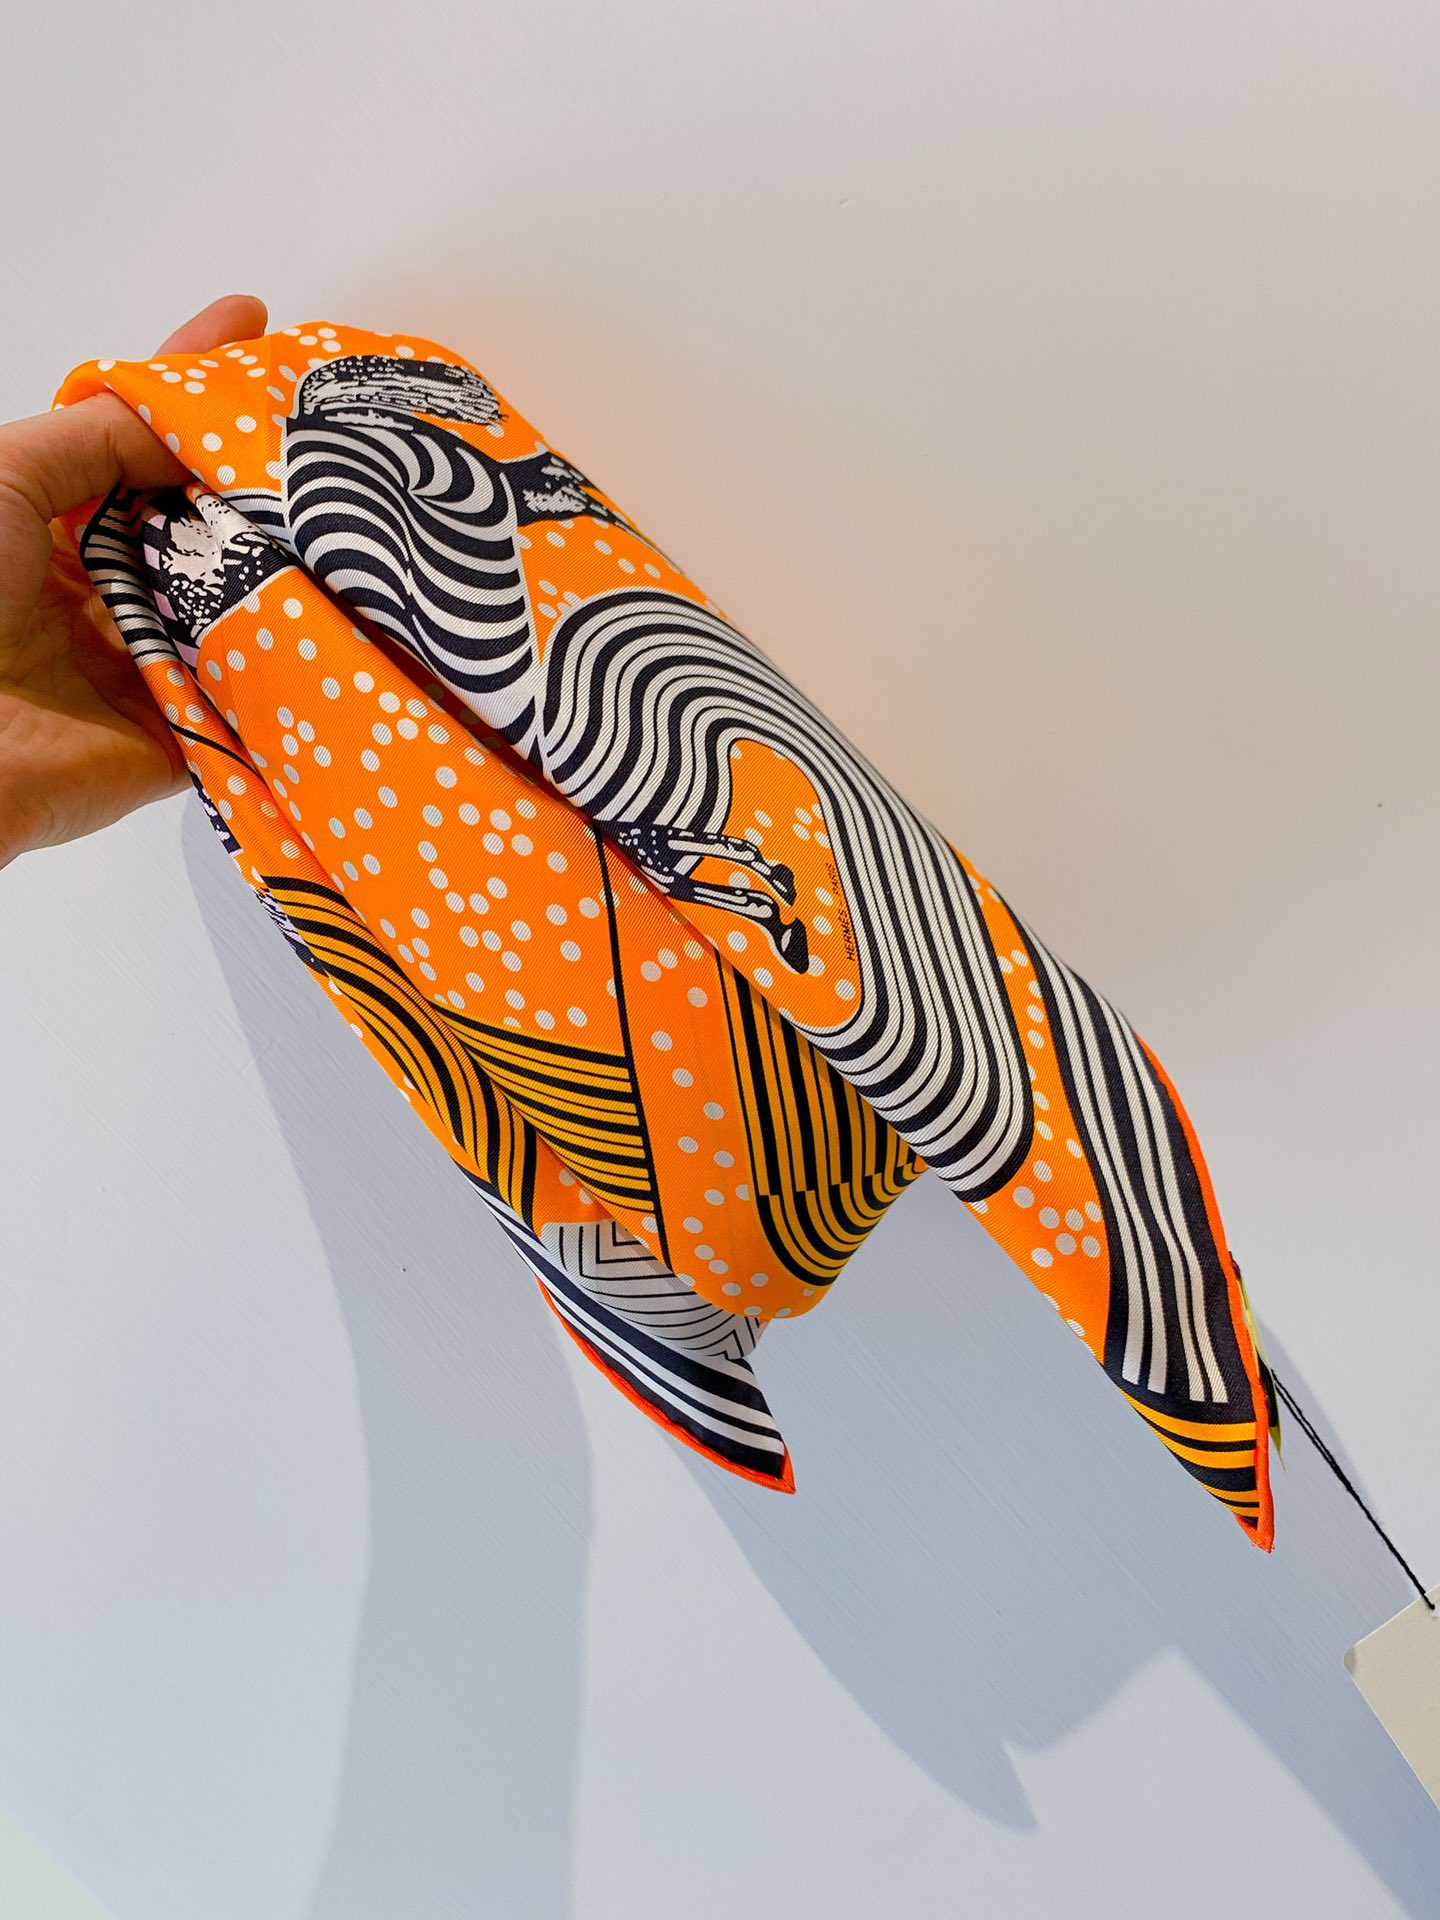 HERMES《波普式骏马》方巾 橙色 90*90cm